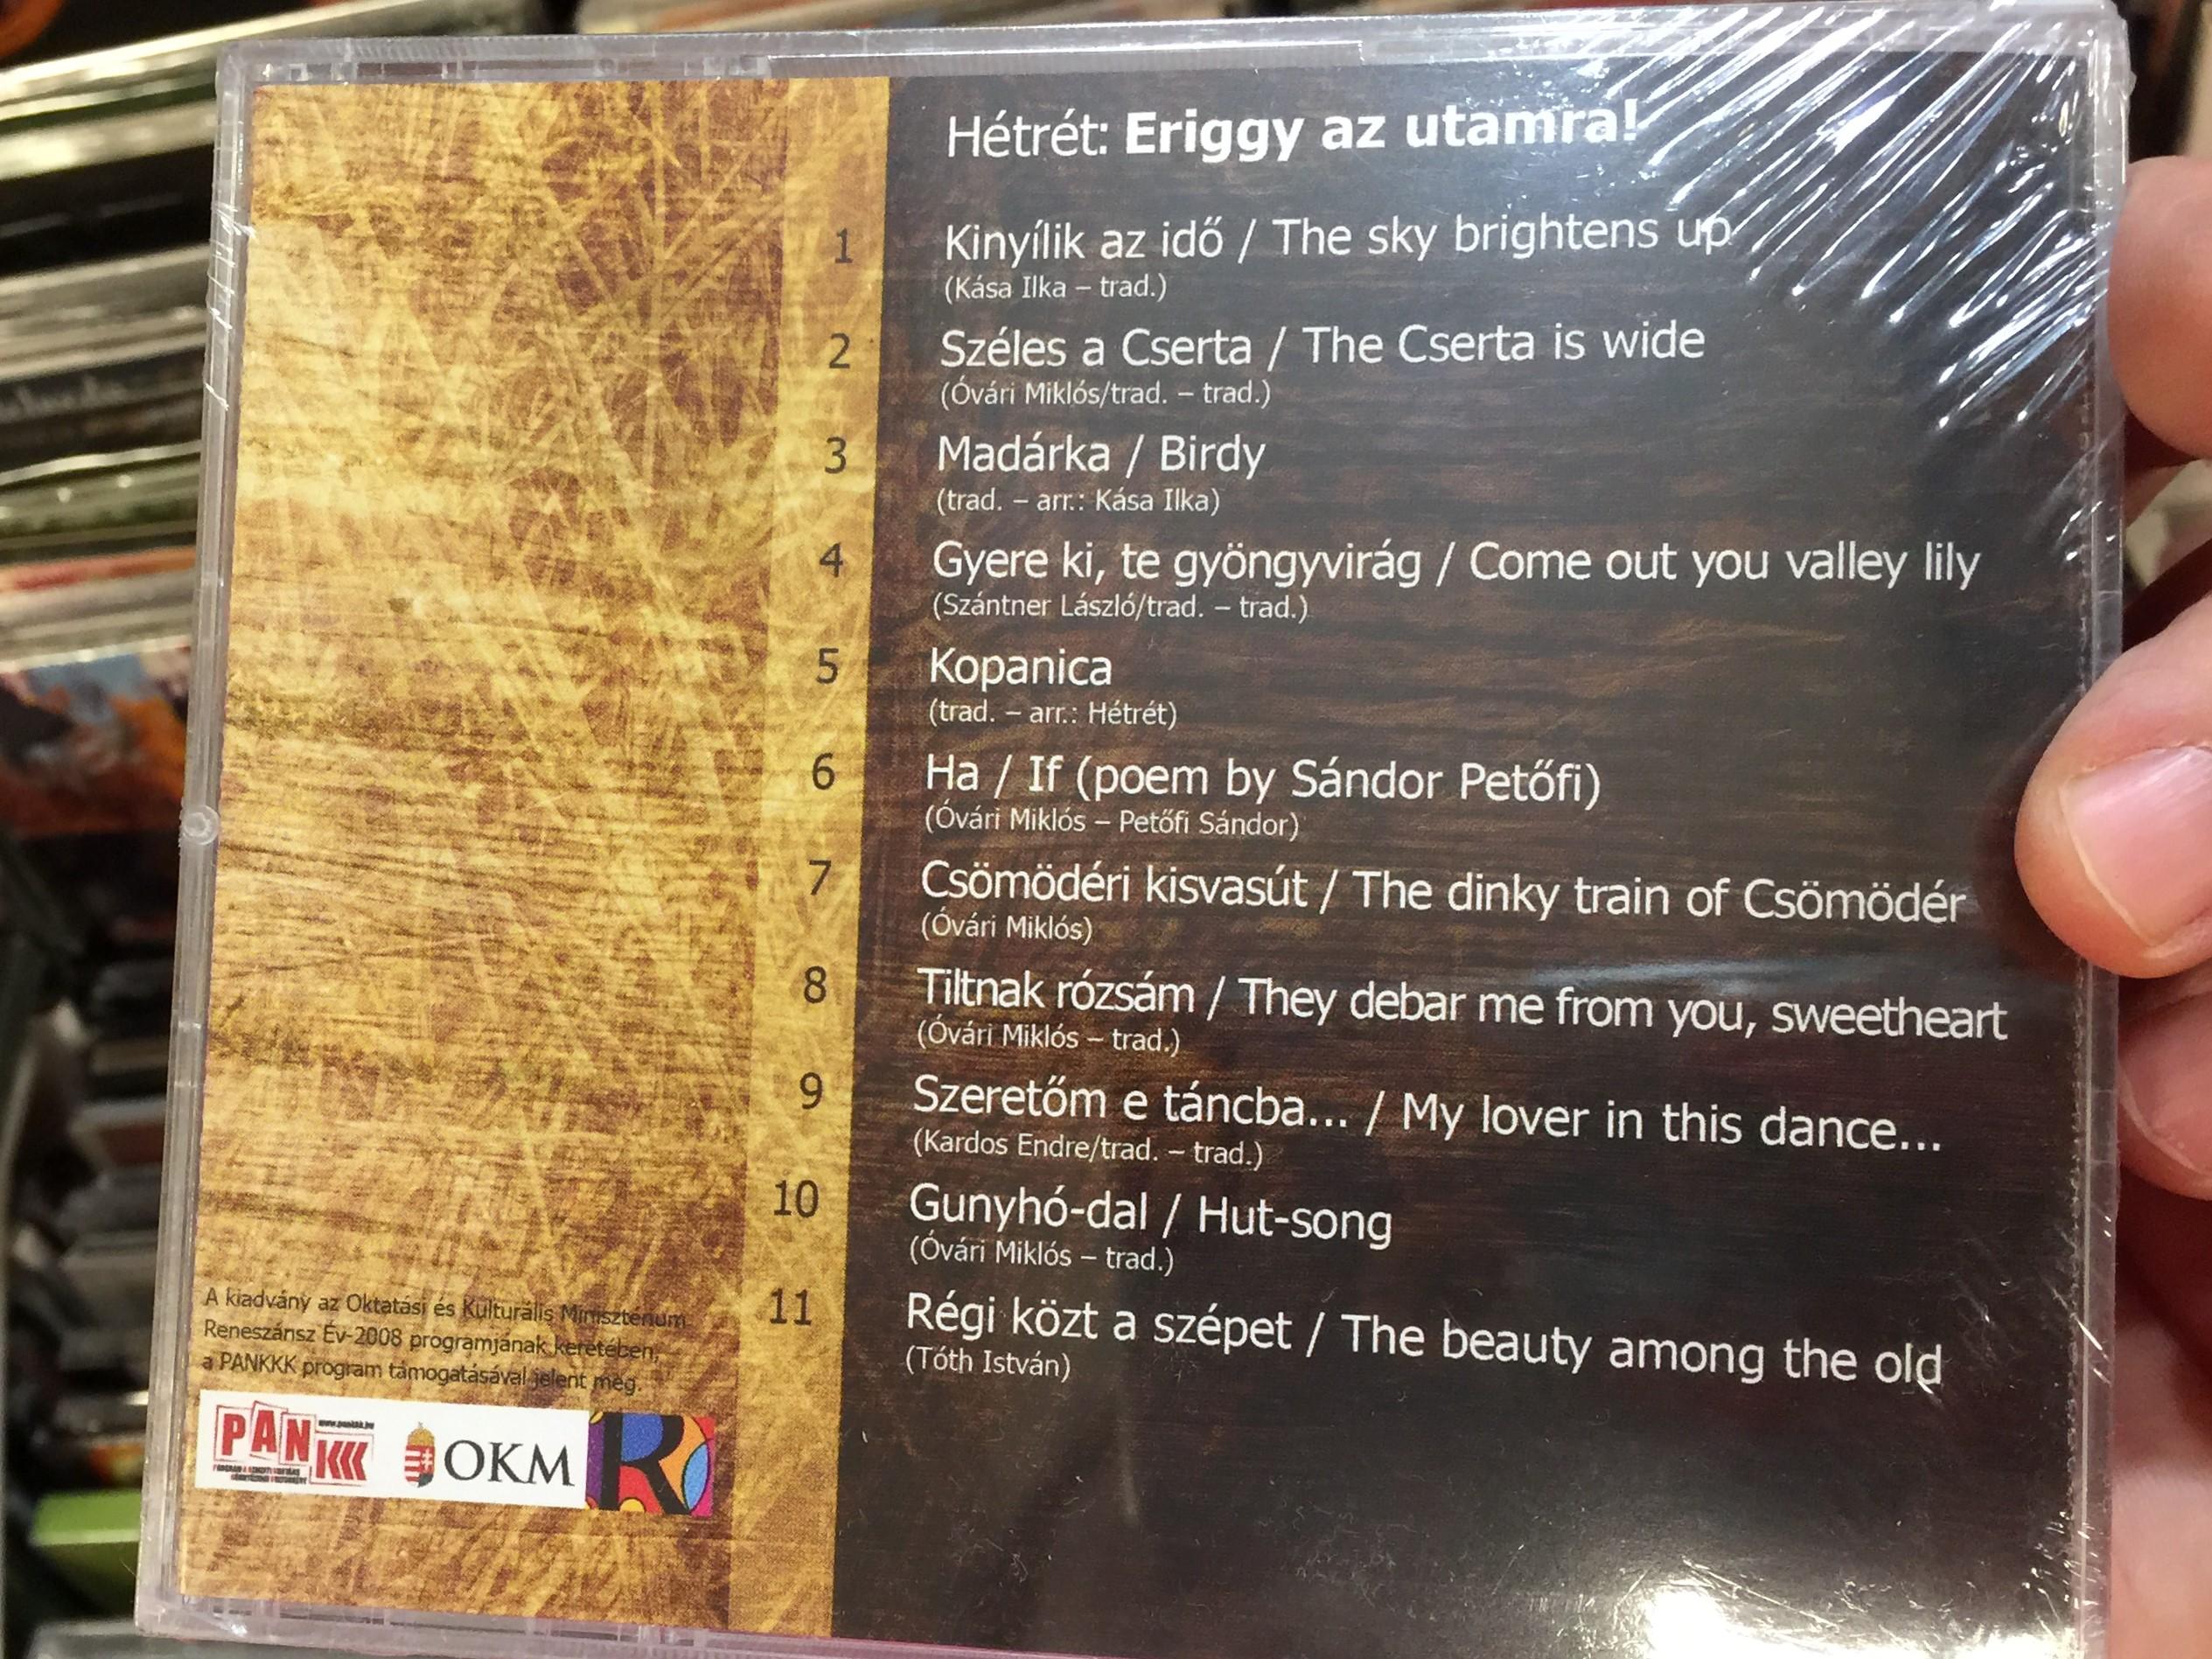 h-tr-t-eriggy-az-utamra-freefolk-3-audio-cd-2008-2-.jpg